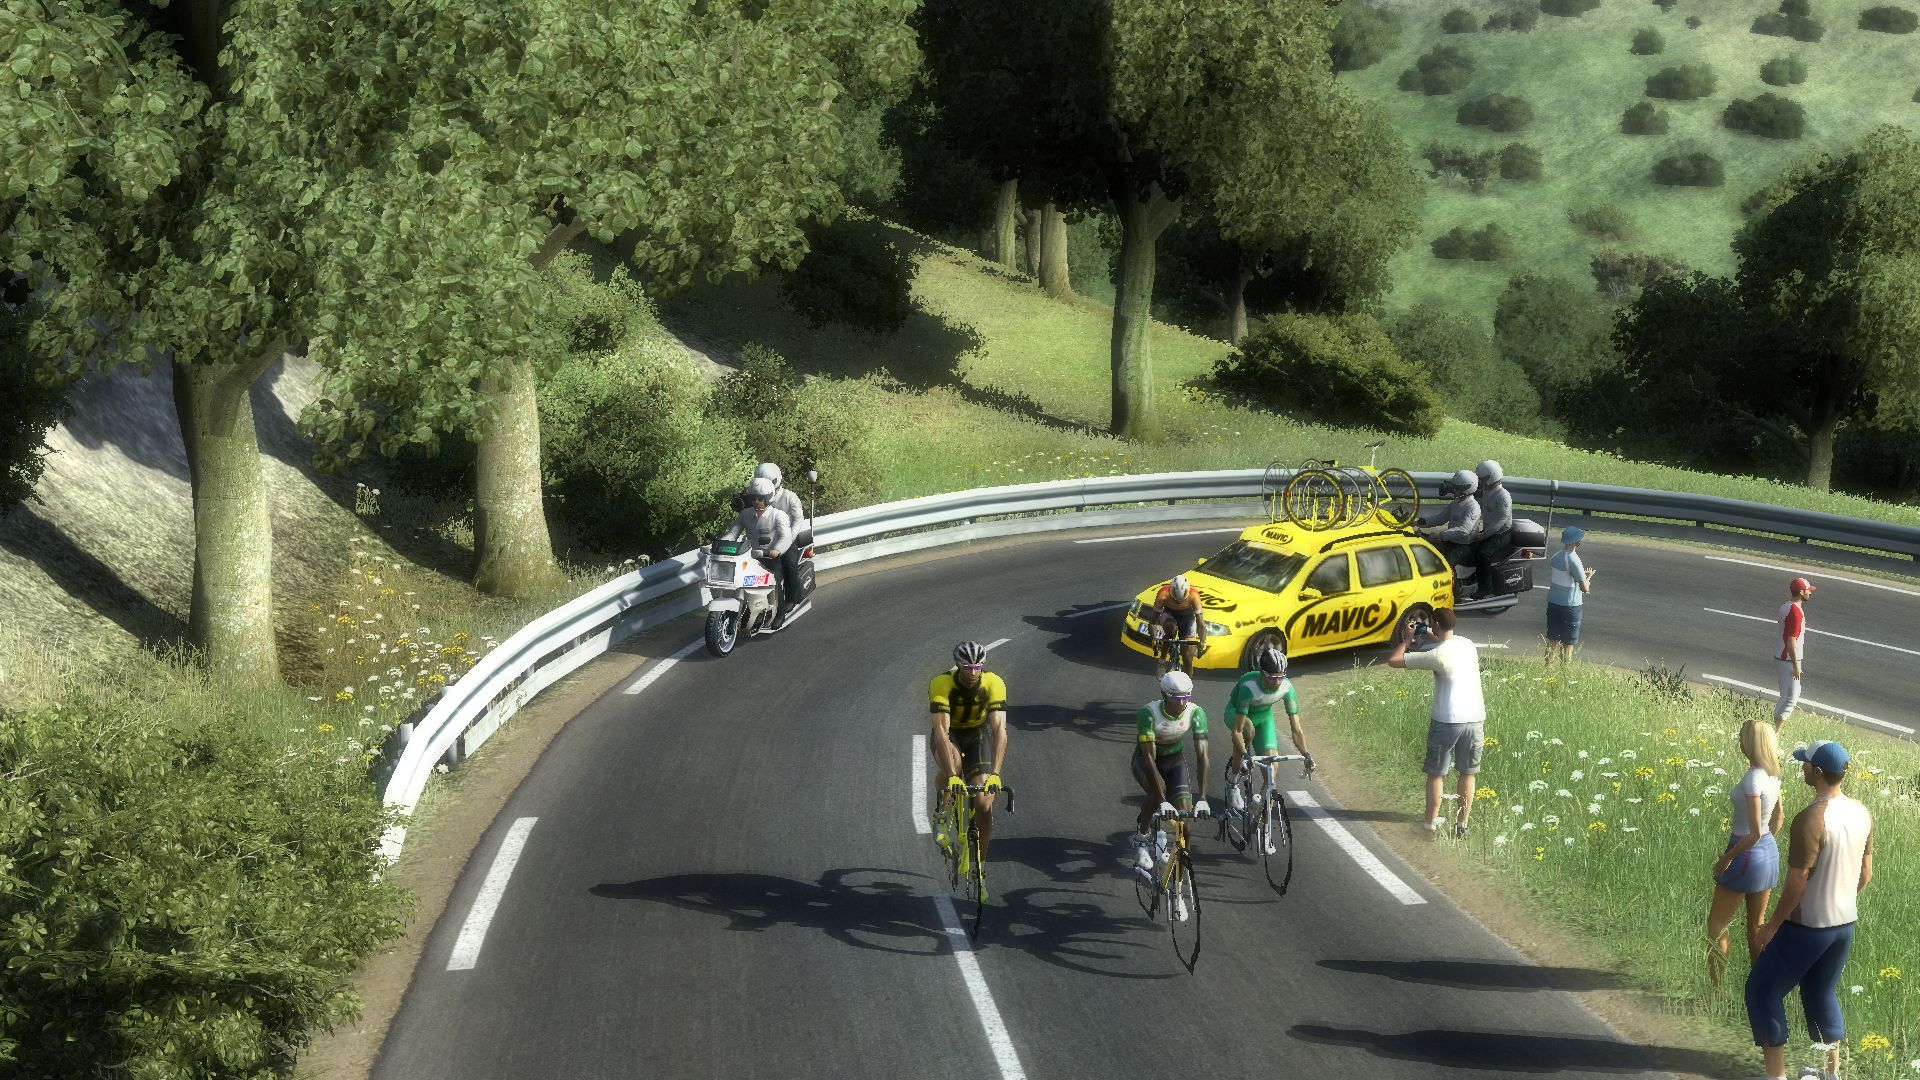 pcmdaily.com/images/mg/2017/Races/U23/Avenir/AVES7%203.jpg